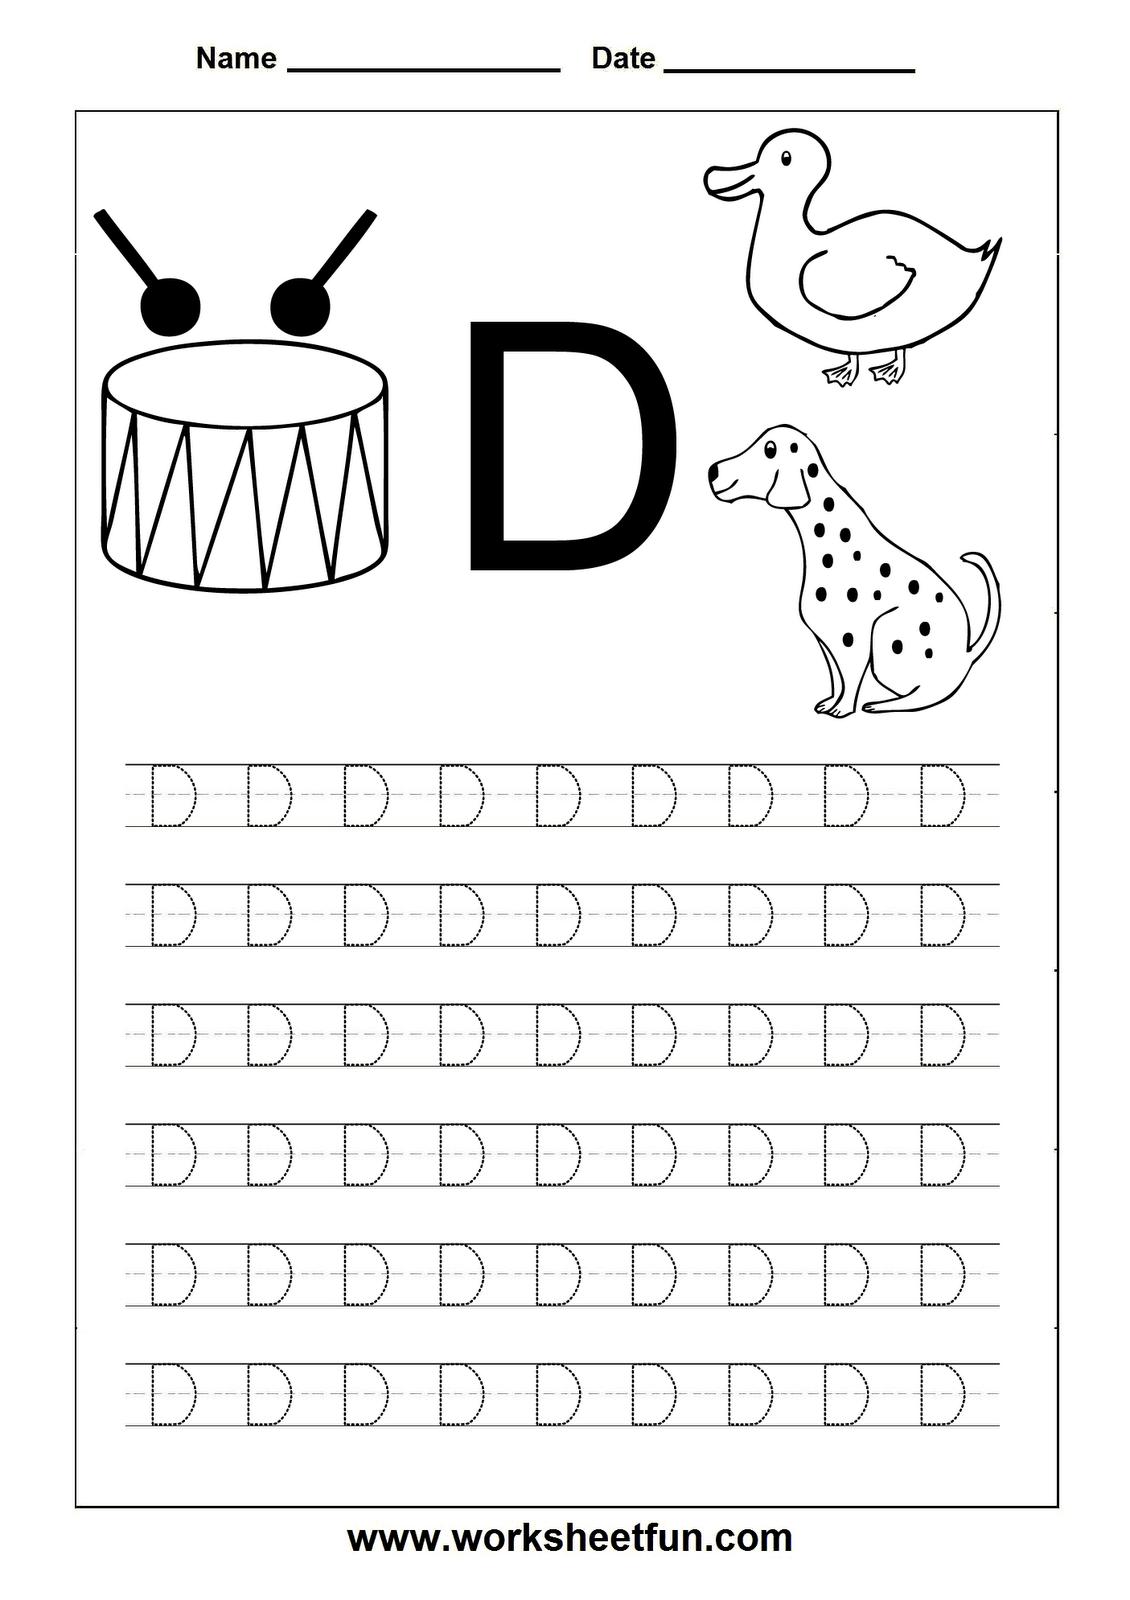 Letter D Worksheets Hd Wallpapers Download Free Letter D inside Alphabet Tracing Hd